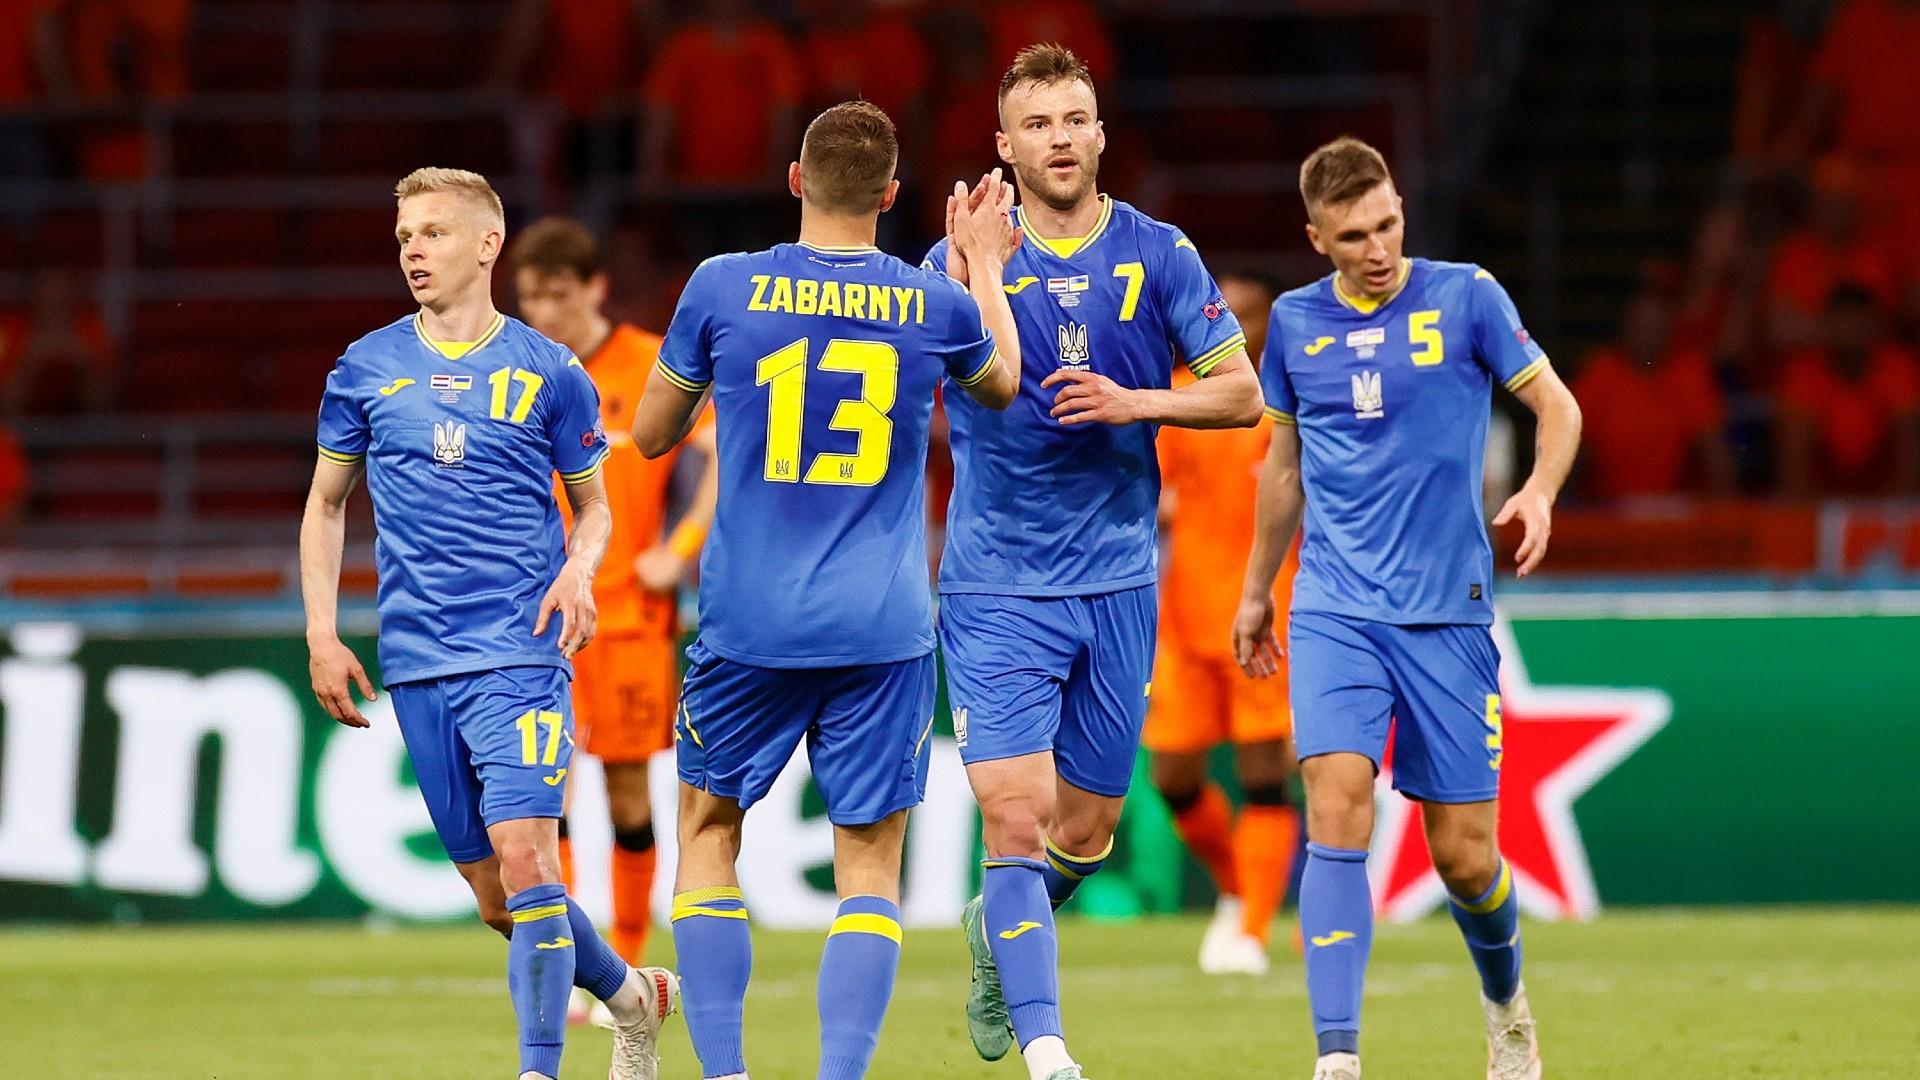 Pays-Bas v Ukraine résumé du match, 13/06/2021, Euro   Goal.com